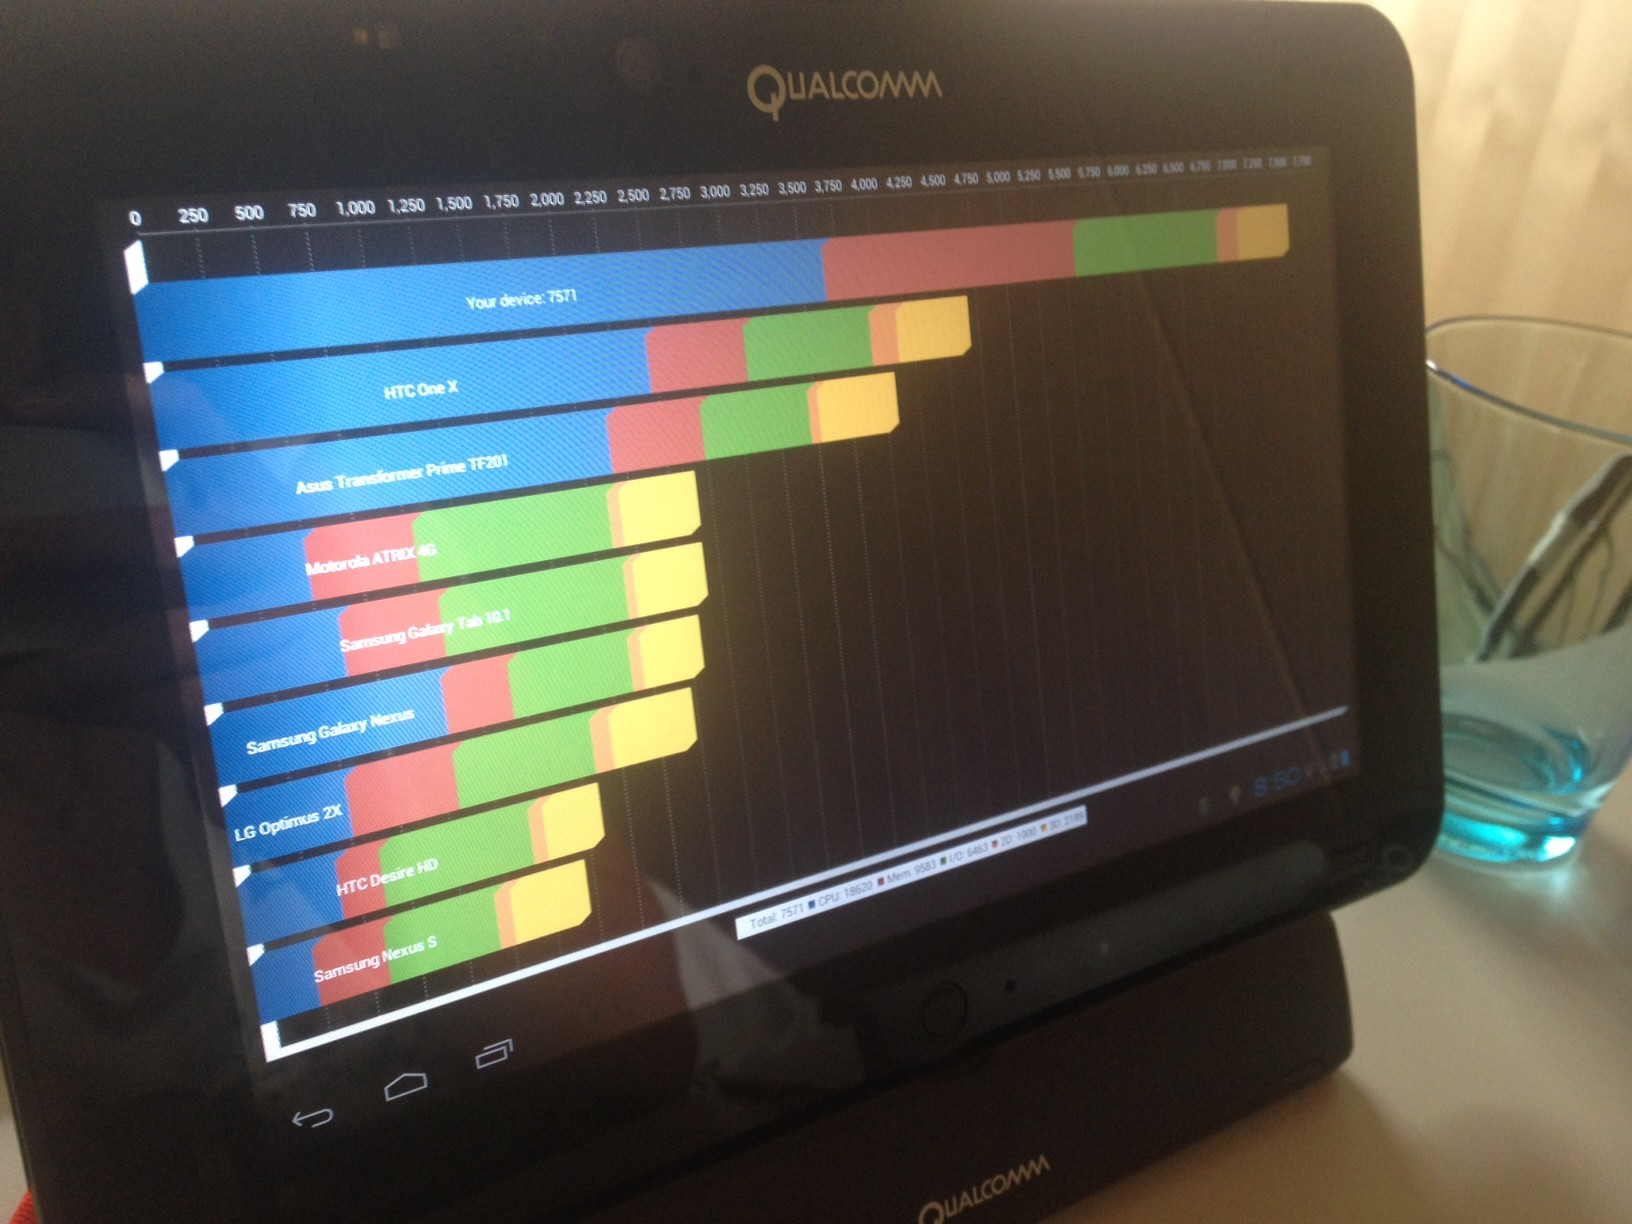 Snapdragon quadrant